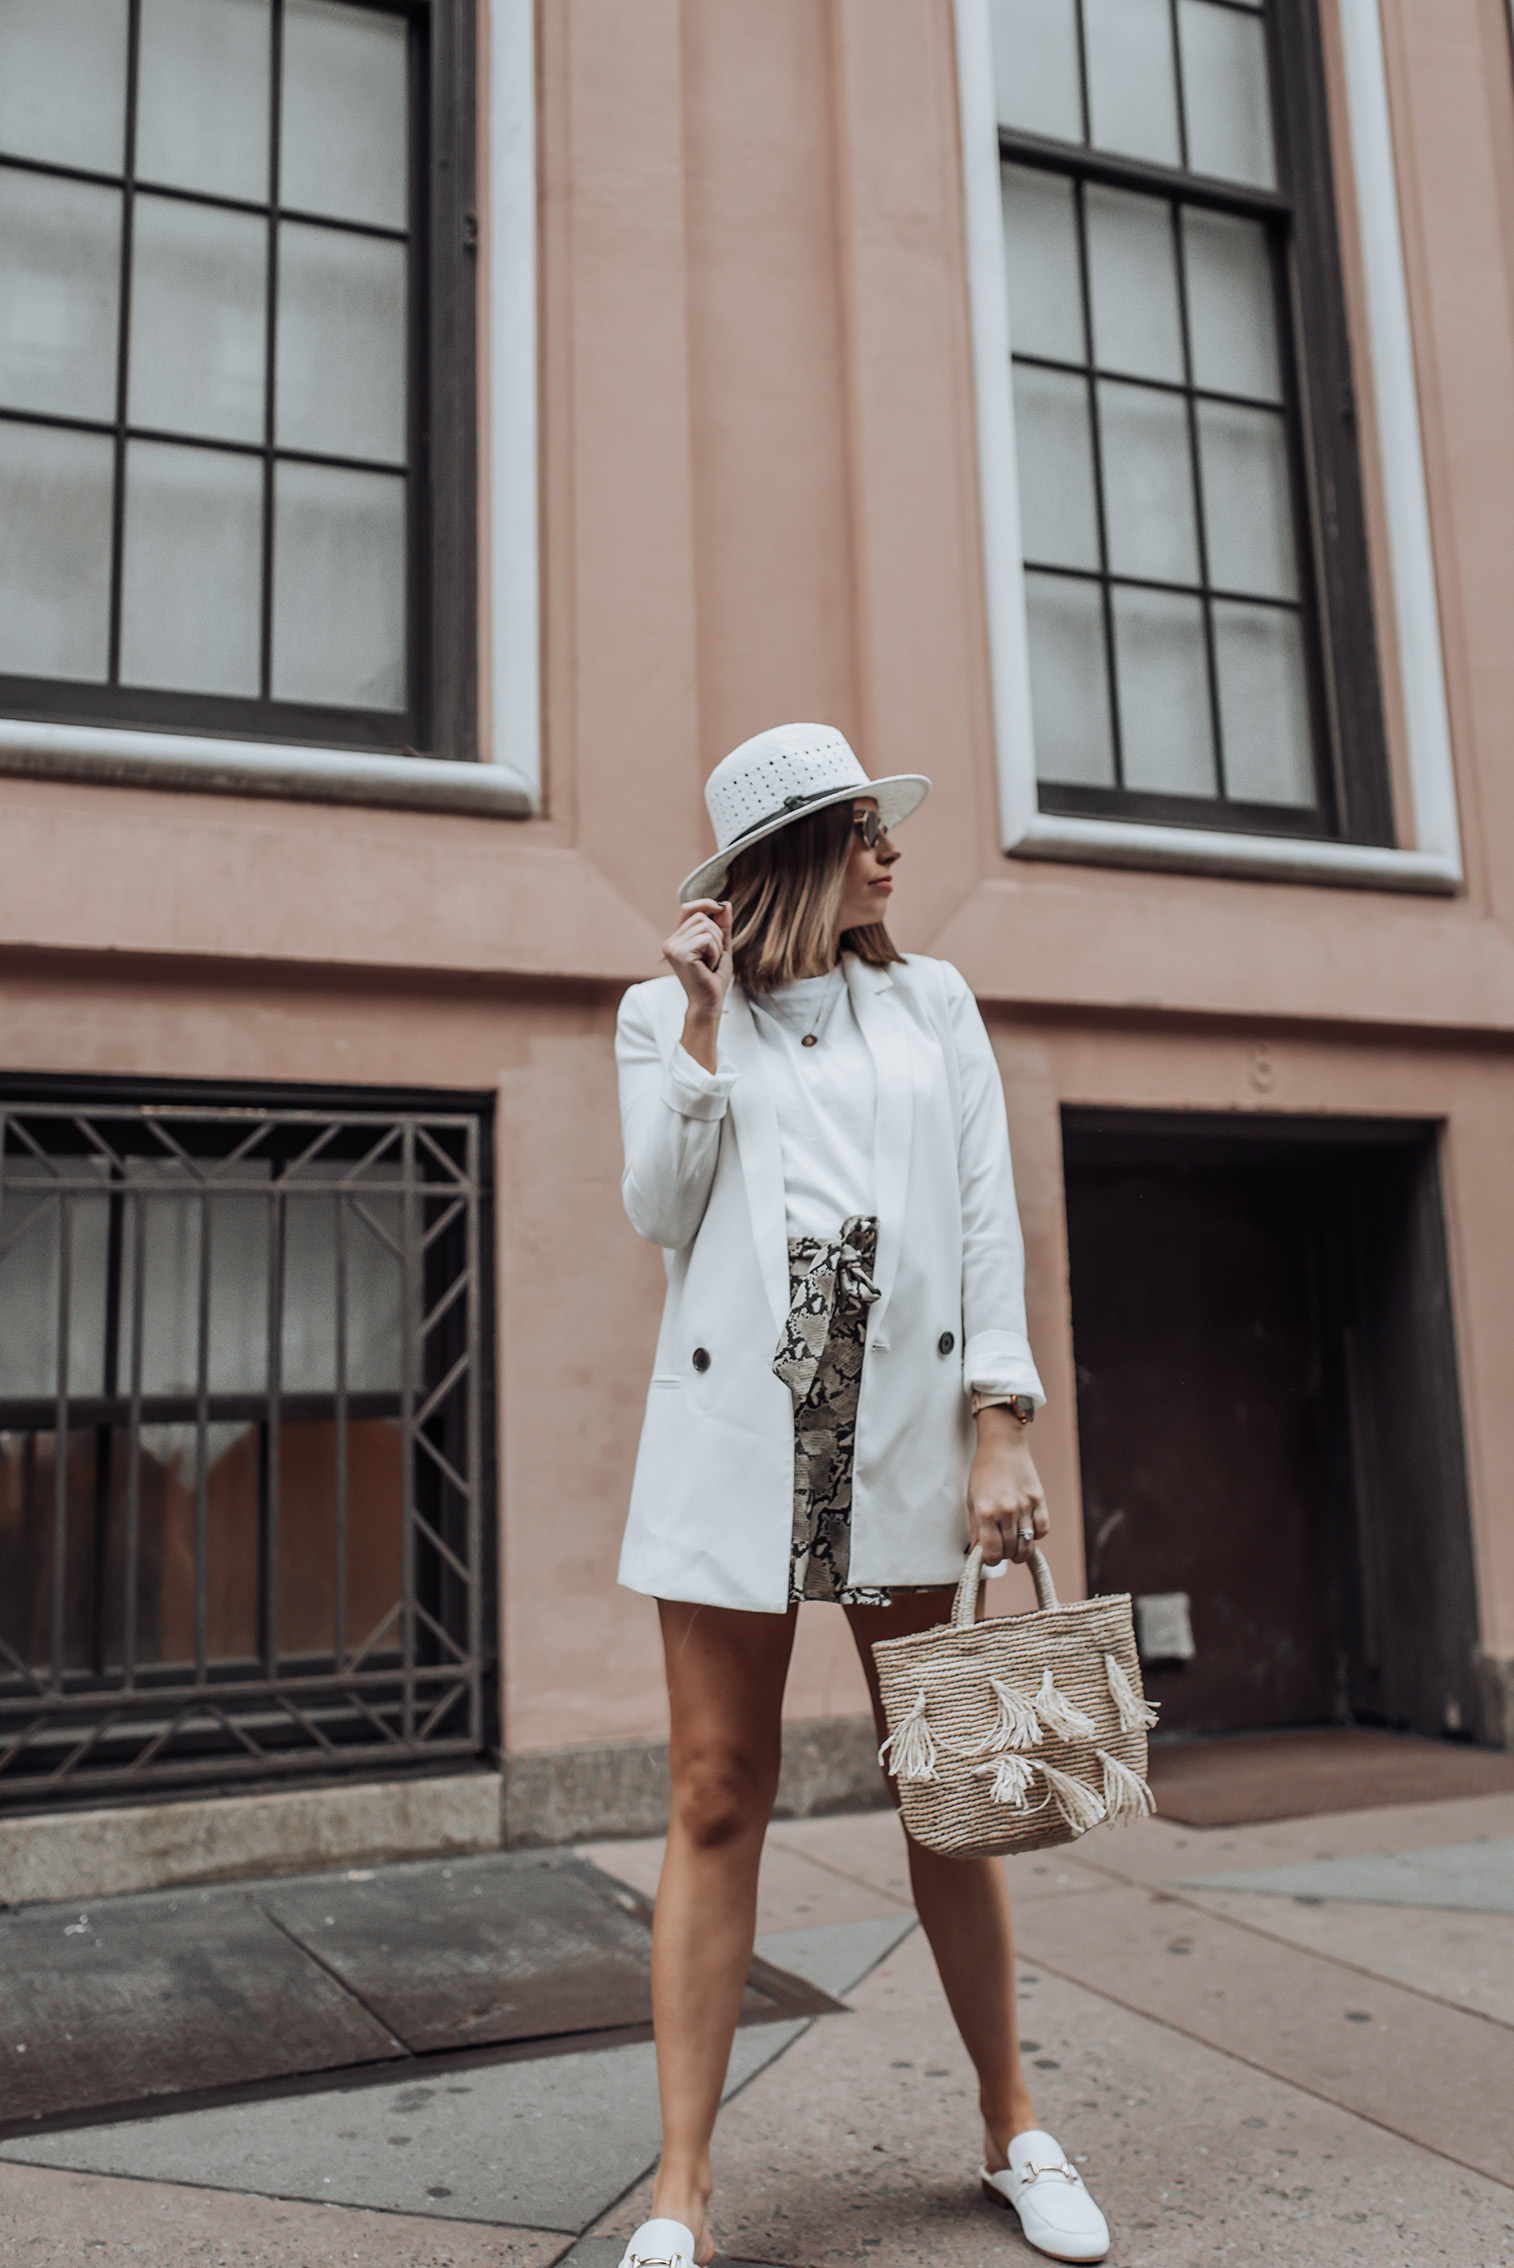 Mixing spring and fall pieces   White mules   Skirt (Zara, similar here)   Similar Hat   White Blazer  Tassel Bag #snakeprint #blazeroutfits #topshop #zara #streetstyle